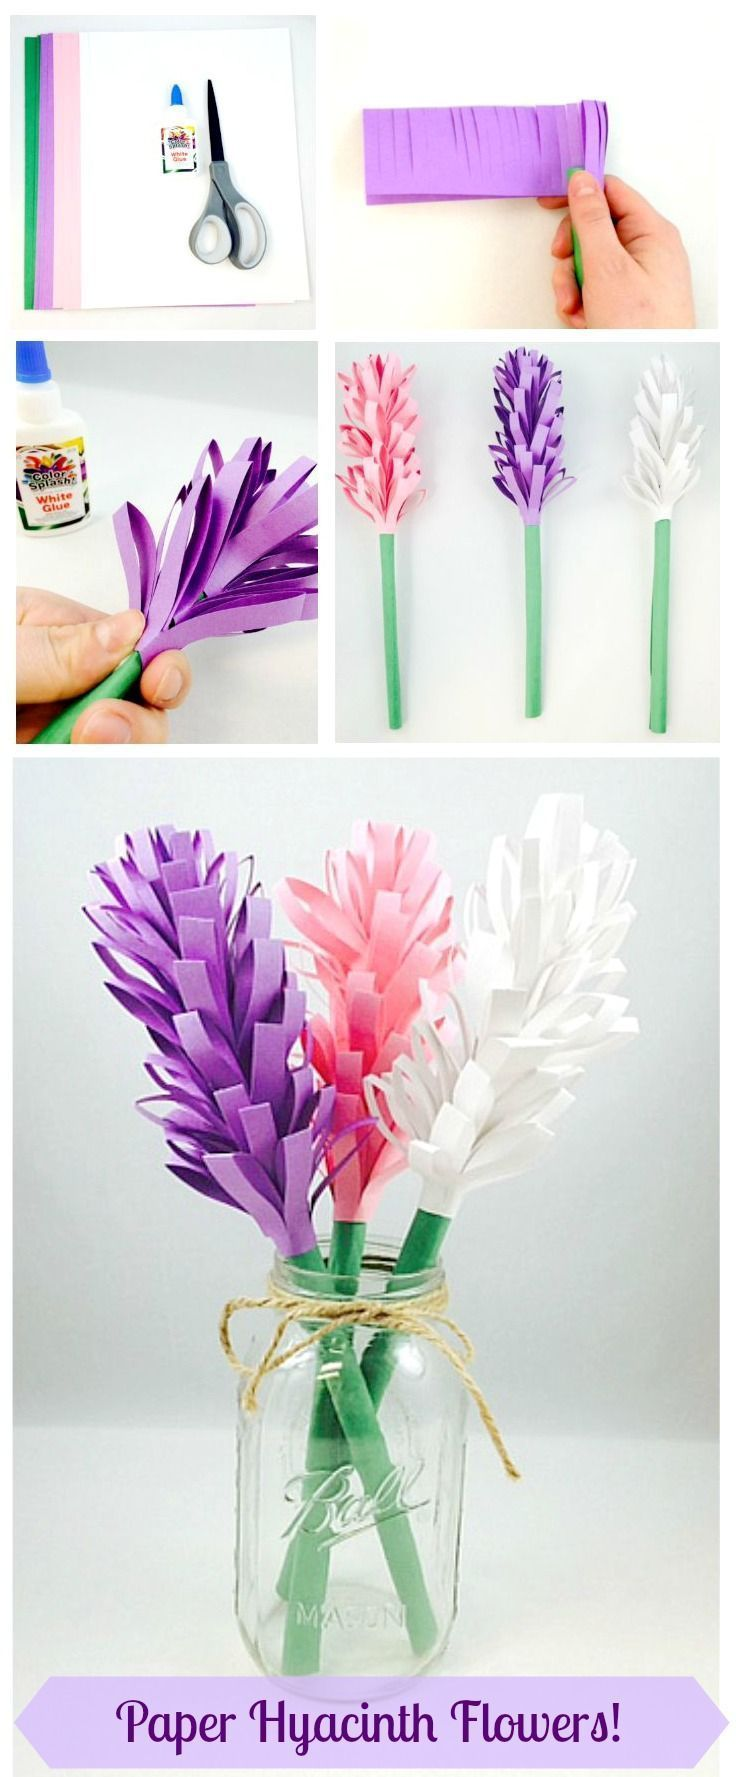 Easy Paper Hyacinth Flowers